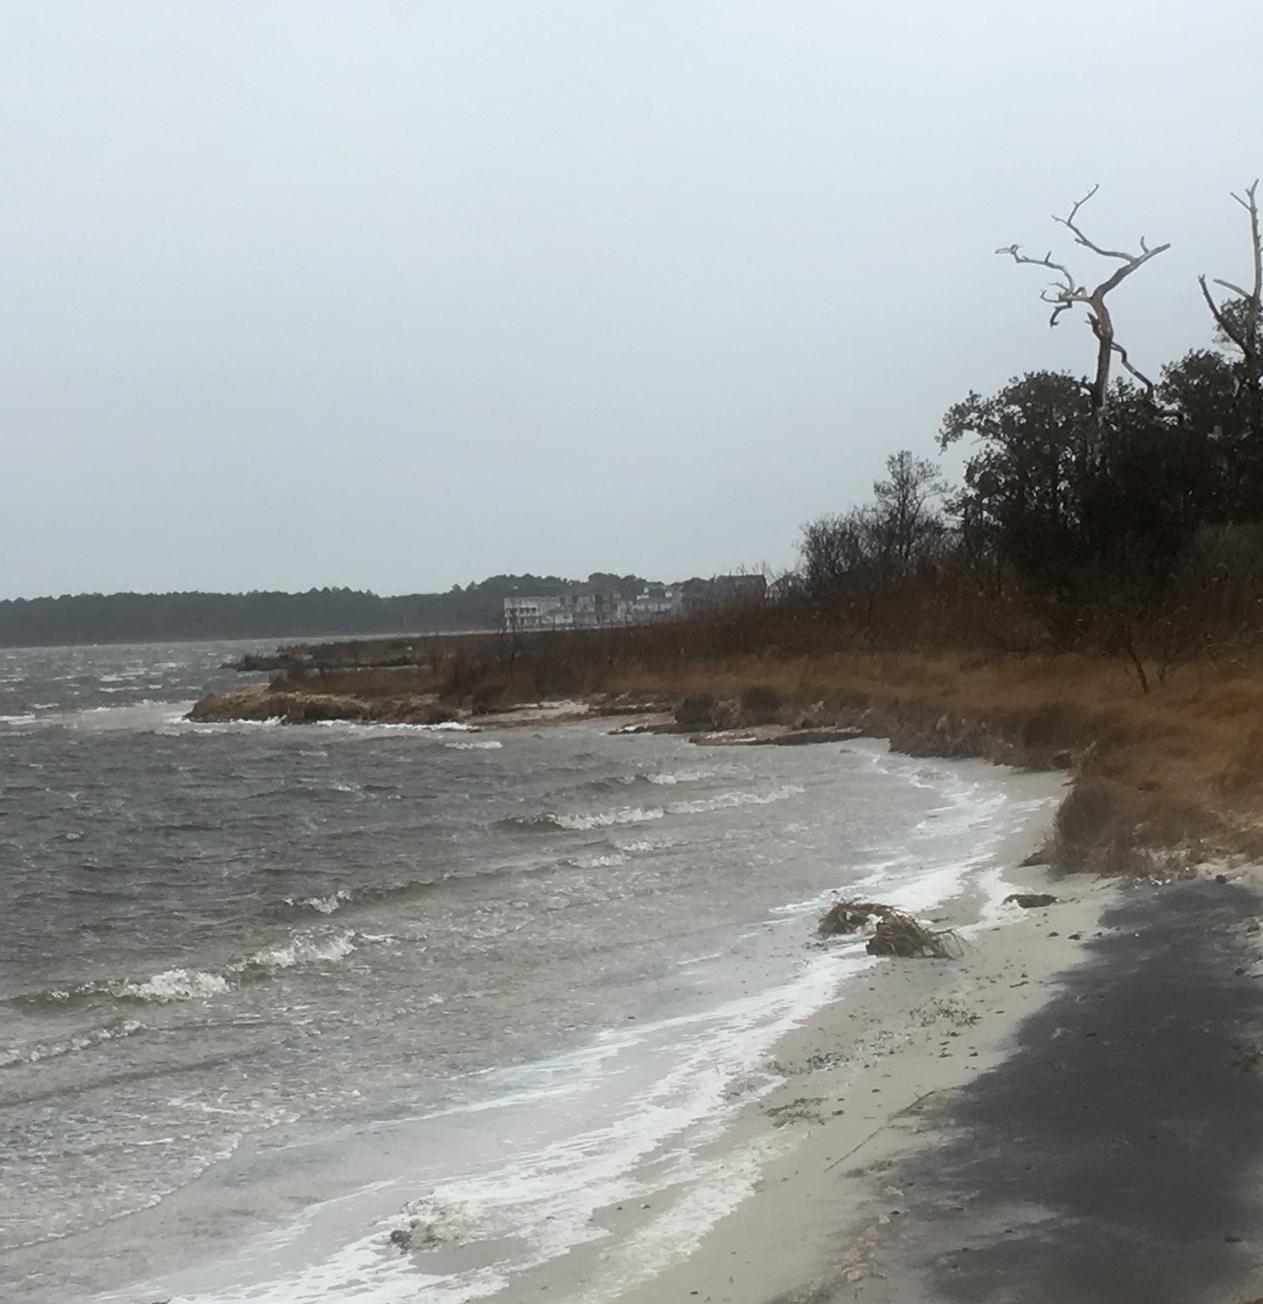 Nor'easter vs. Coastal Delaware